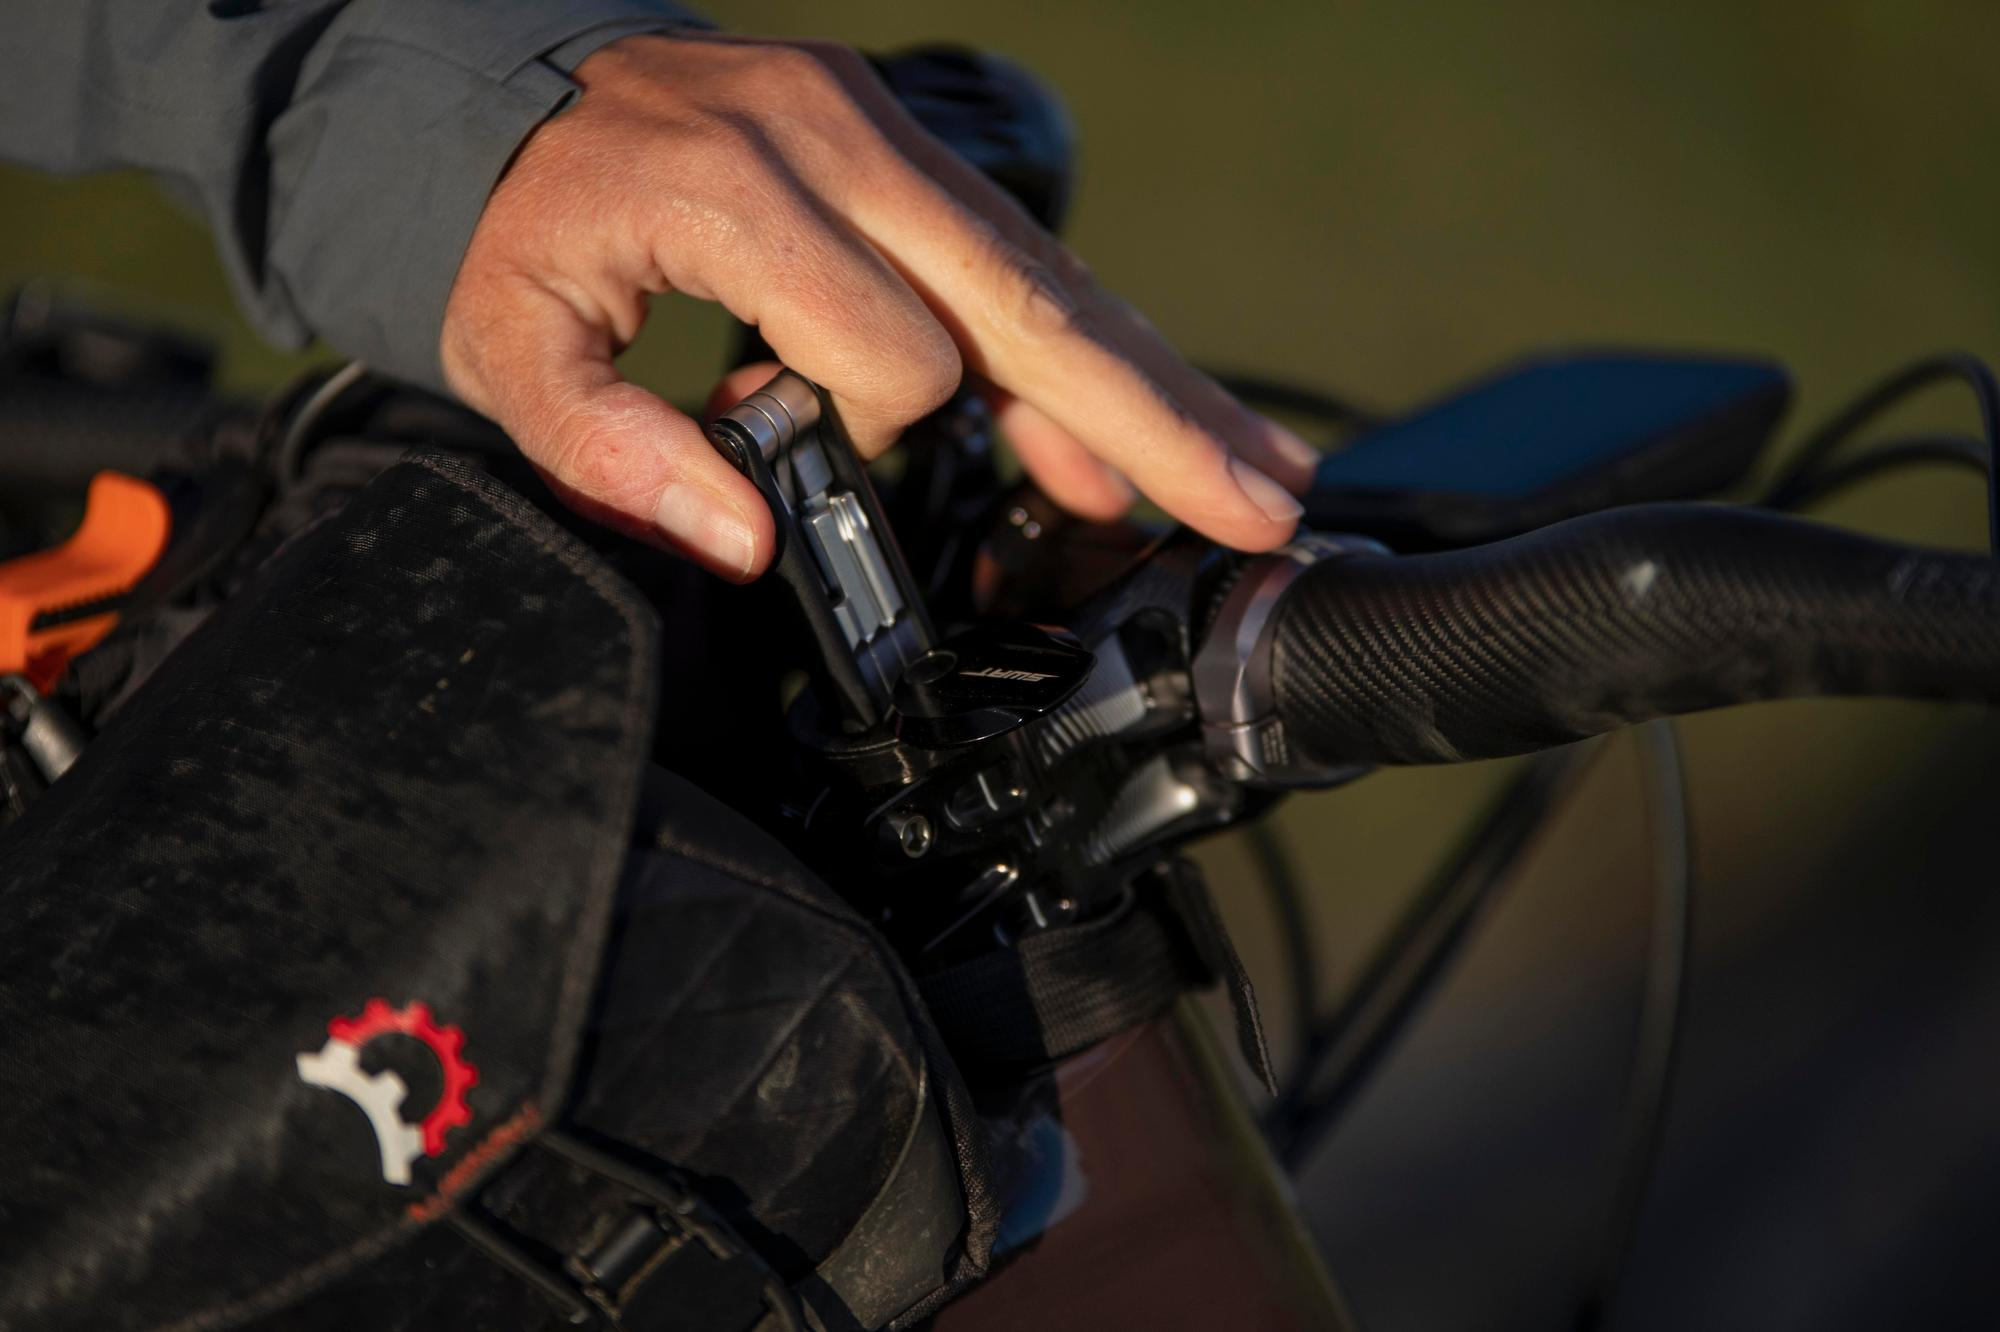 Lael Wilcox Kenai 250 Bike & Gear 029